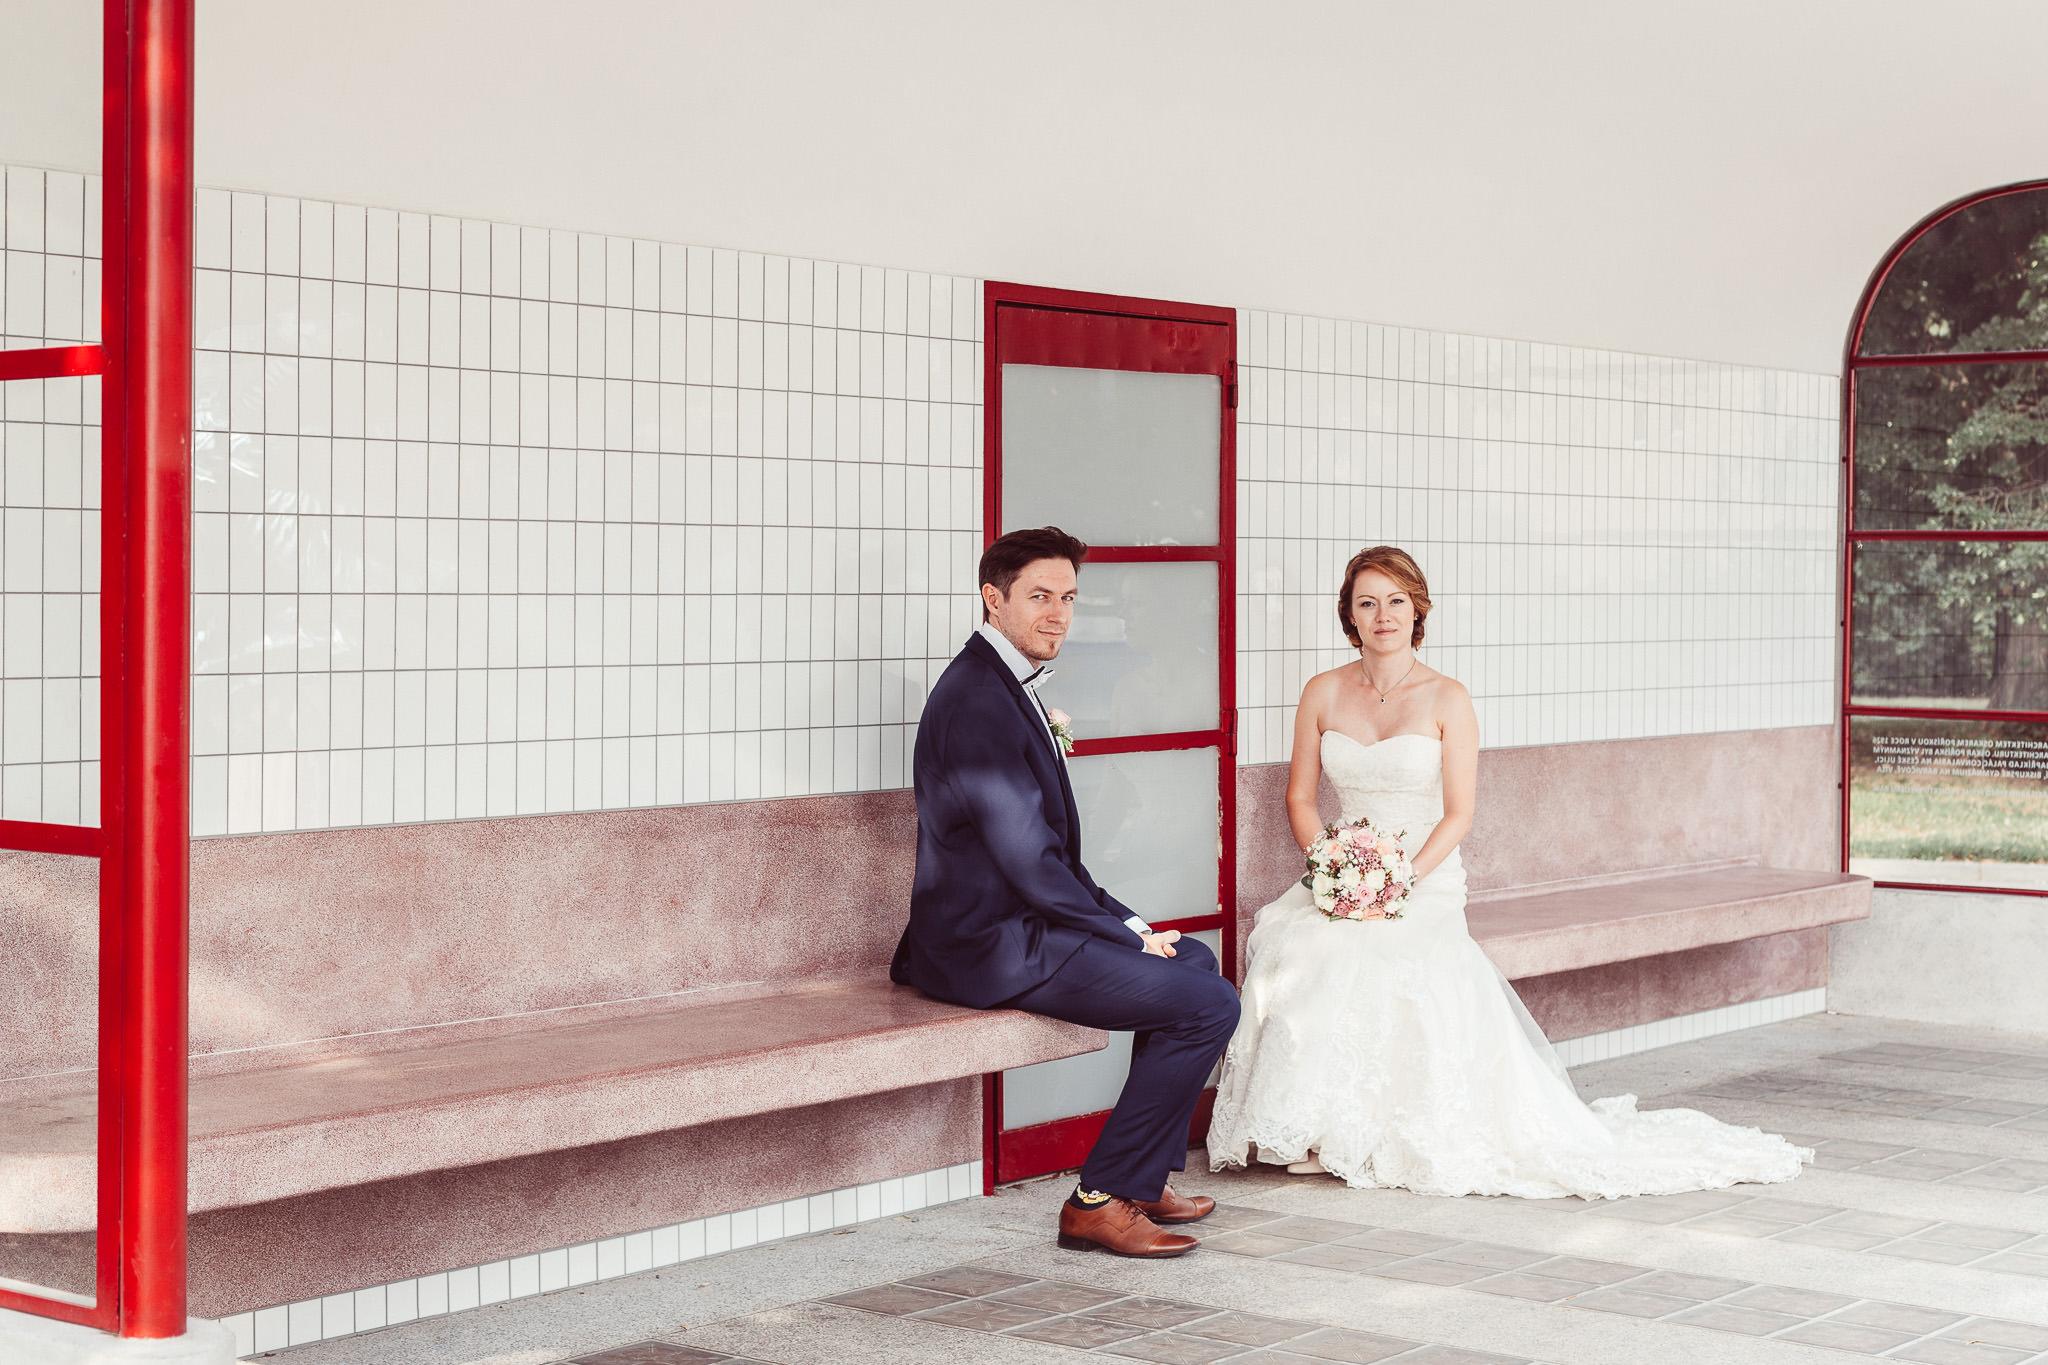 kubousfoto_svatebni_fotograf_brno_wedding_Veselka Serkovi_227